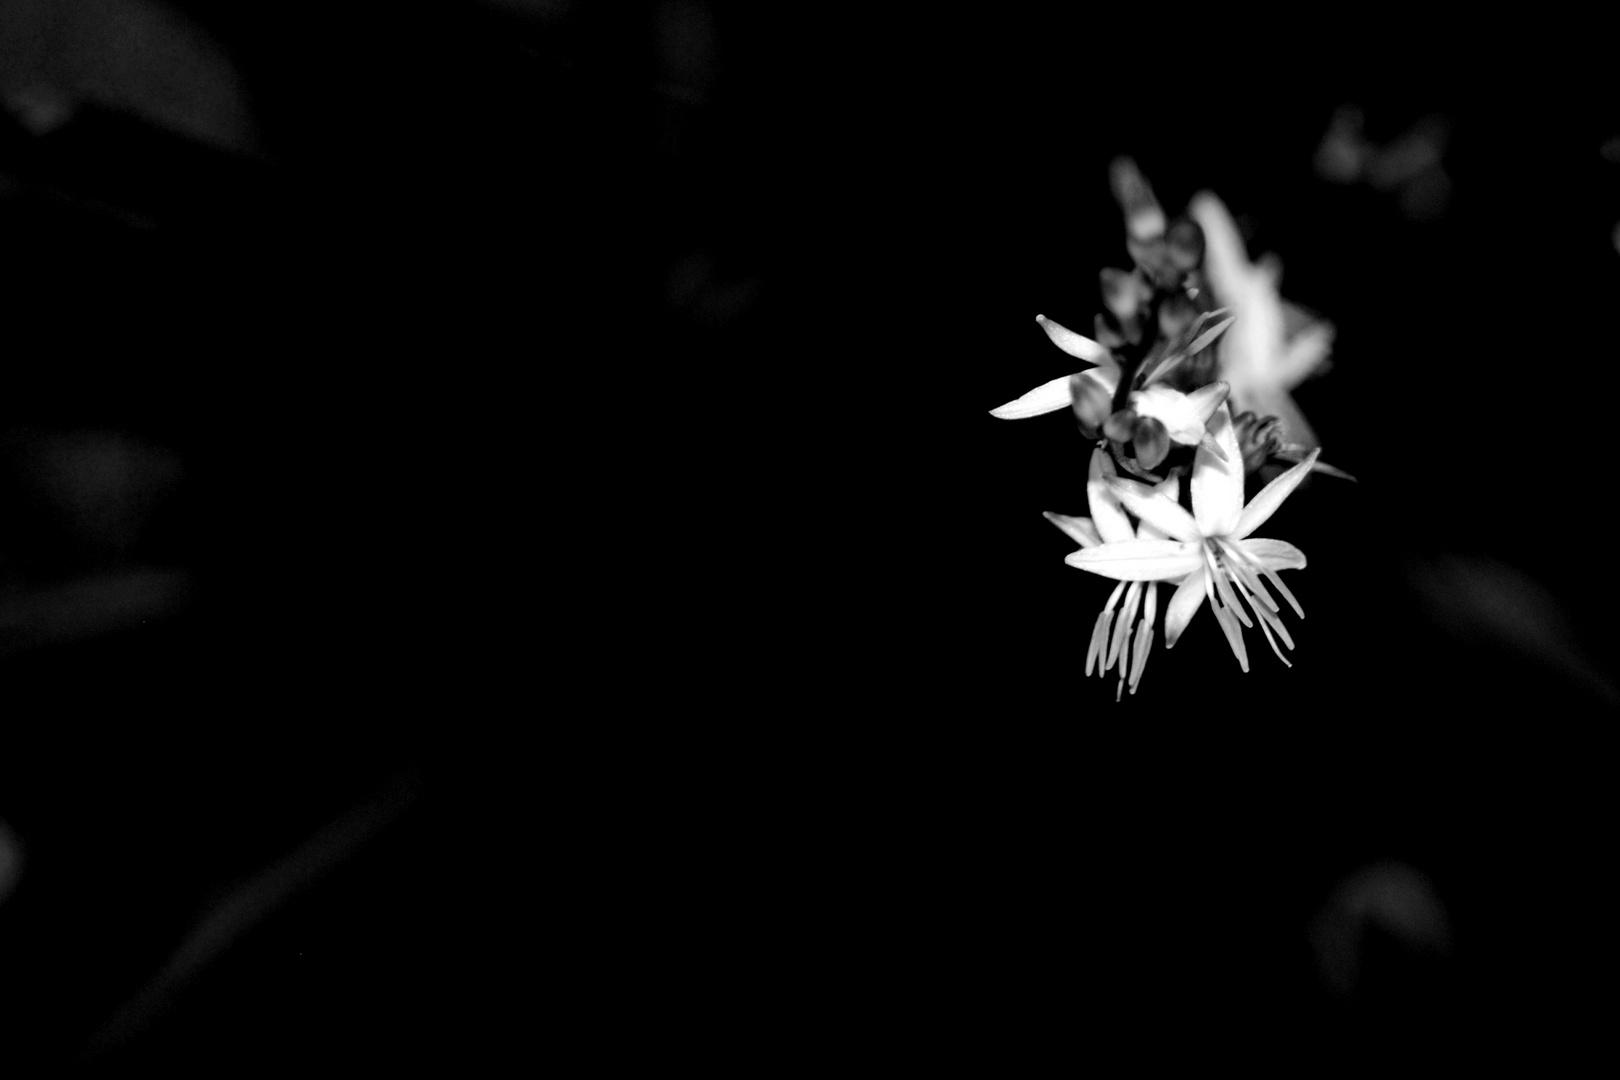 Black And White Flower Photo Image Plants Fungi Lichens